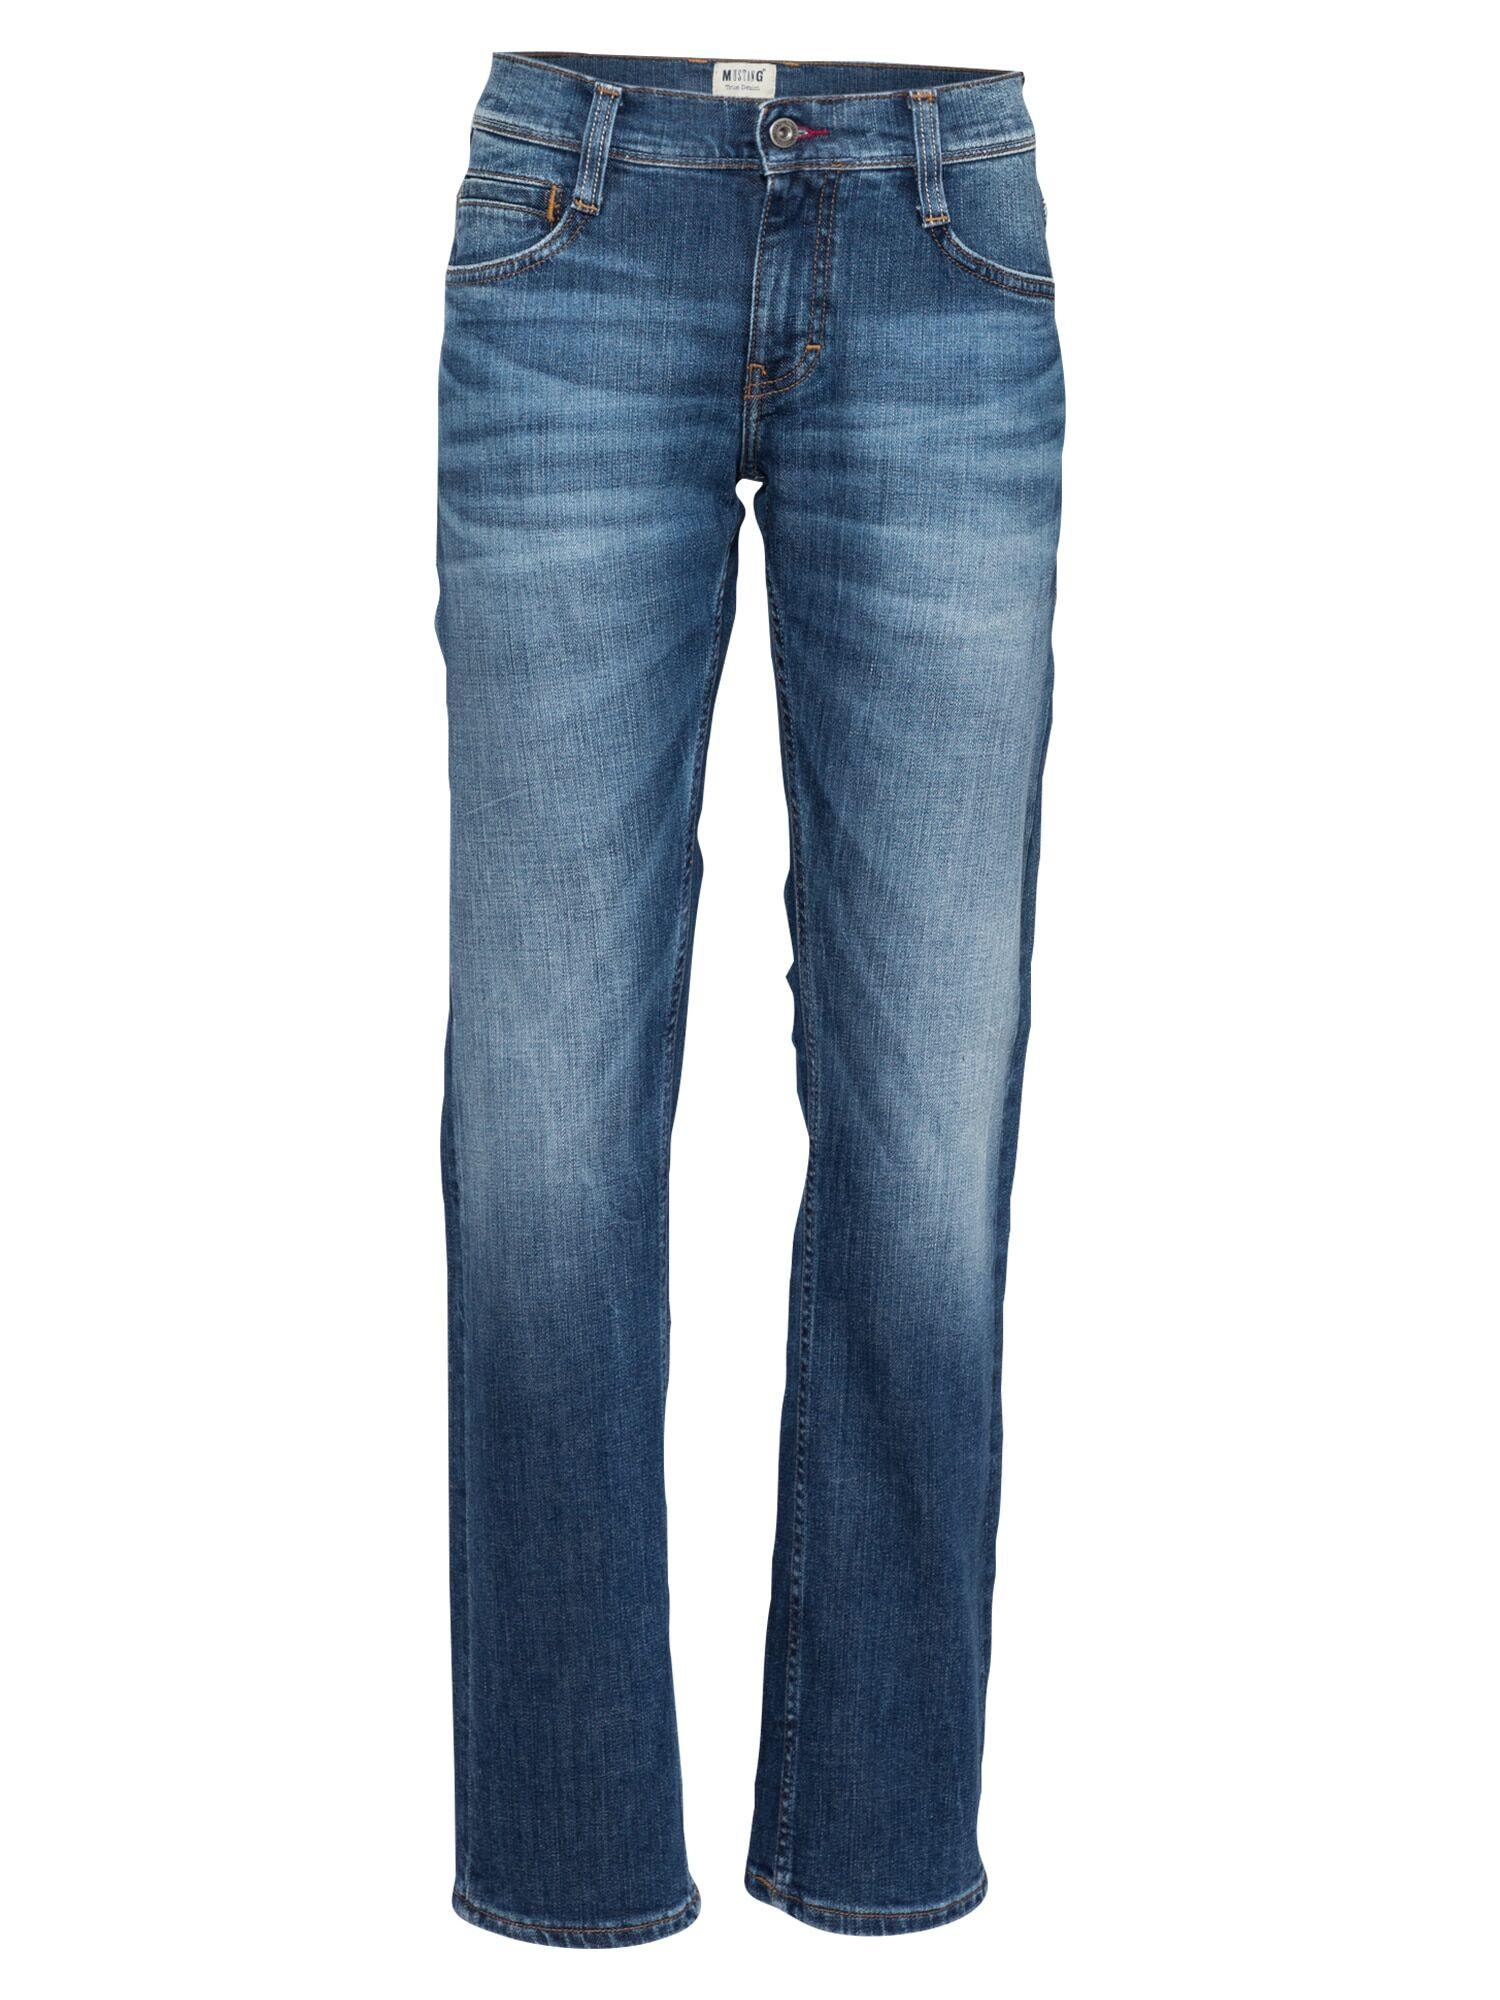 MUSTANG Jean 'Oregon '  - Bleu - Taille: 29/32 - male